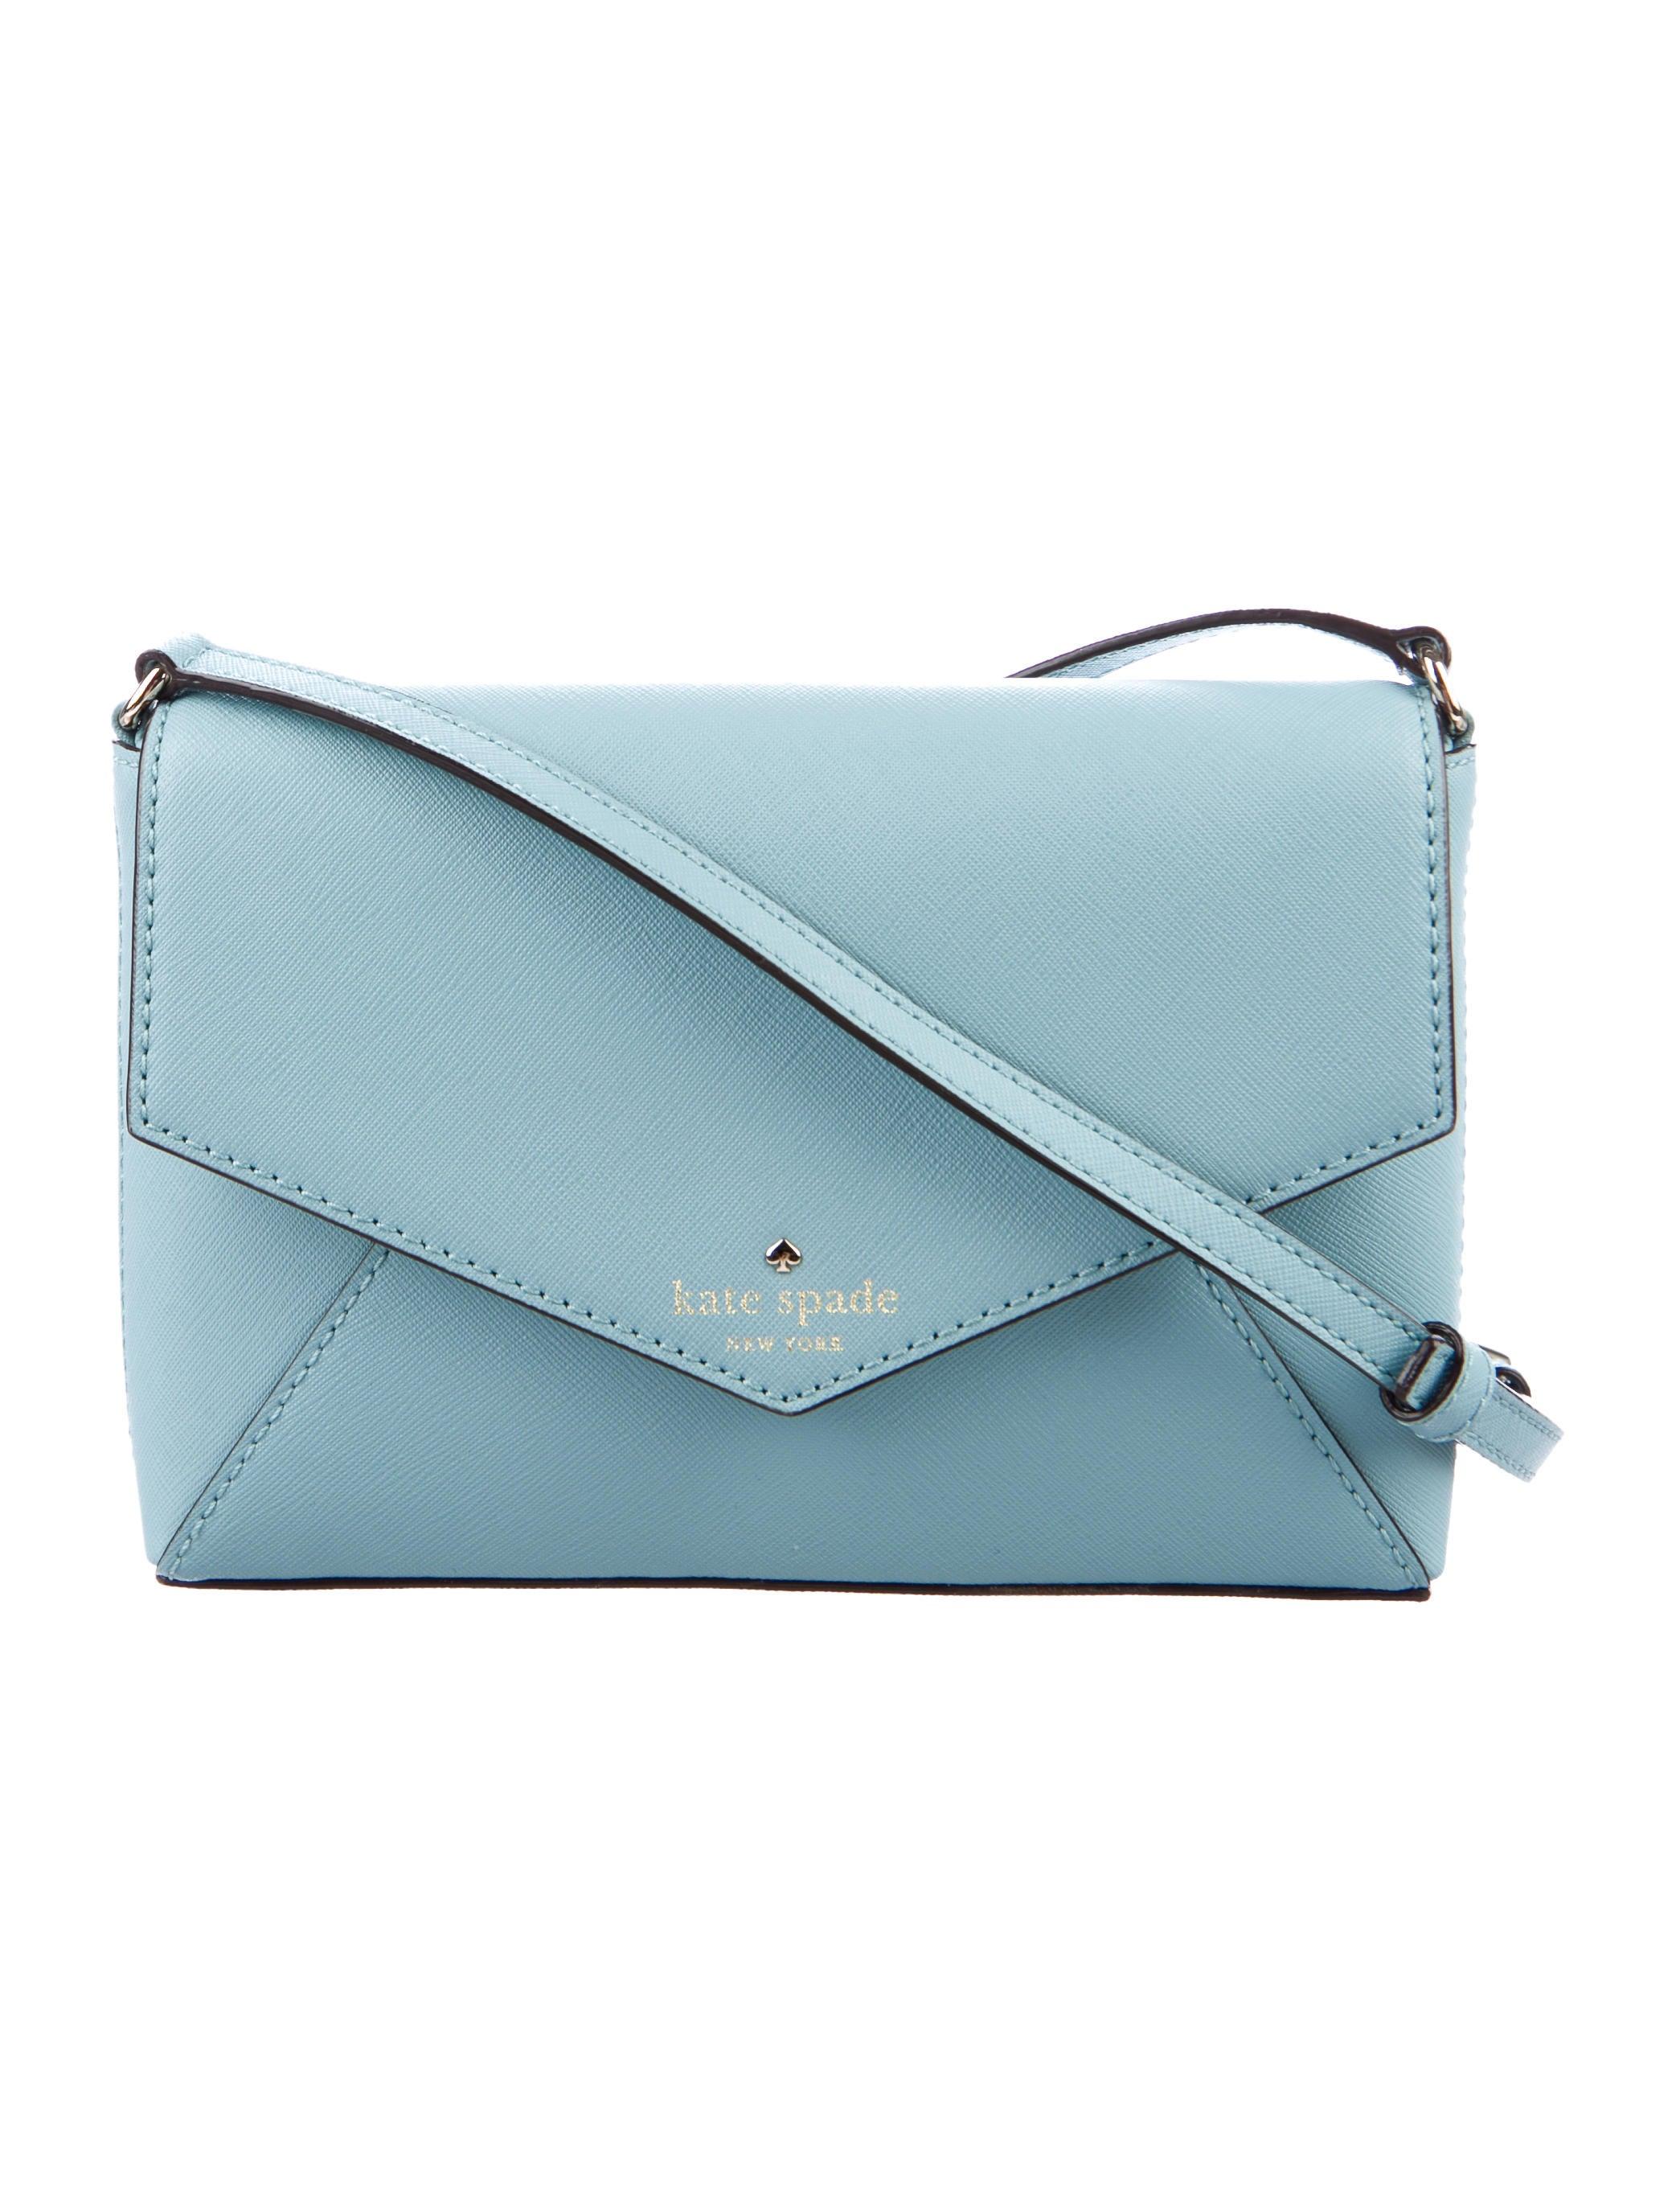 Kate Spade New York Cedar Street Large Monday Bag - Handbags ... 5da74b0e45d98